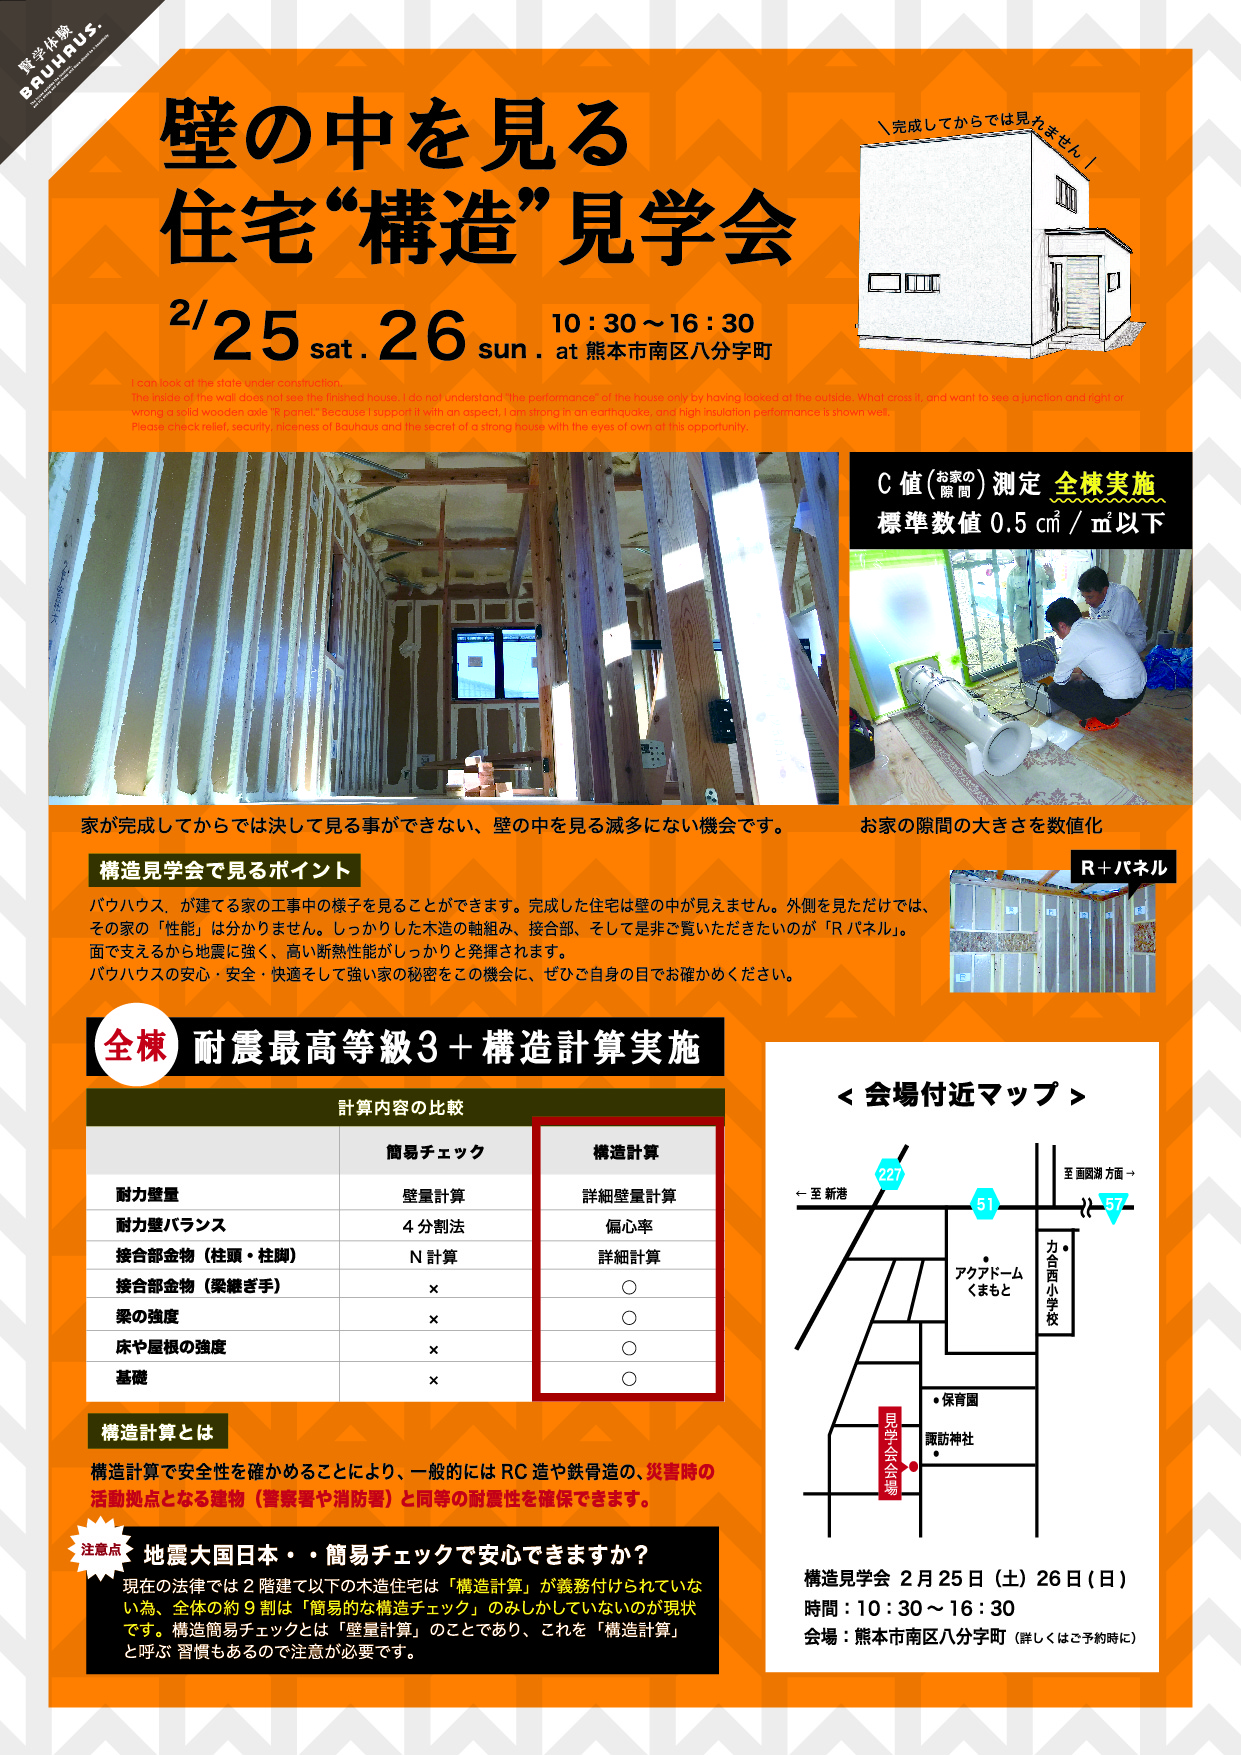 水足様邸構造見学会入稿a4_posting_out-02